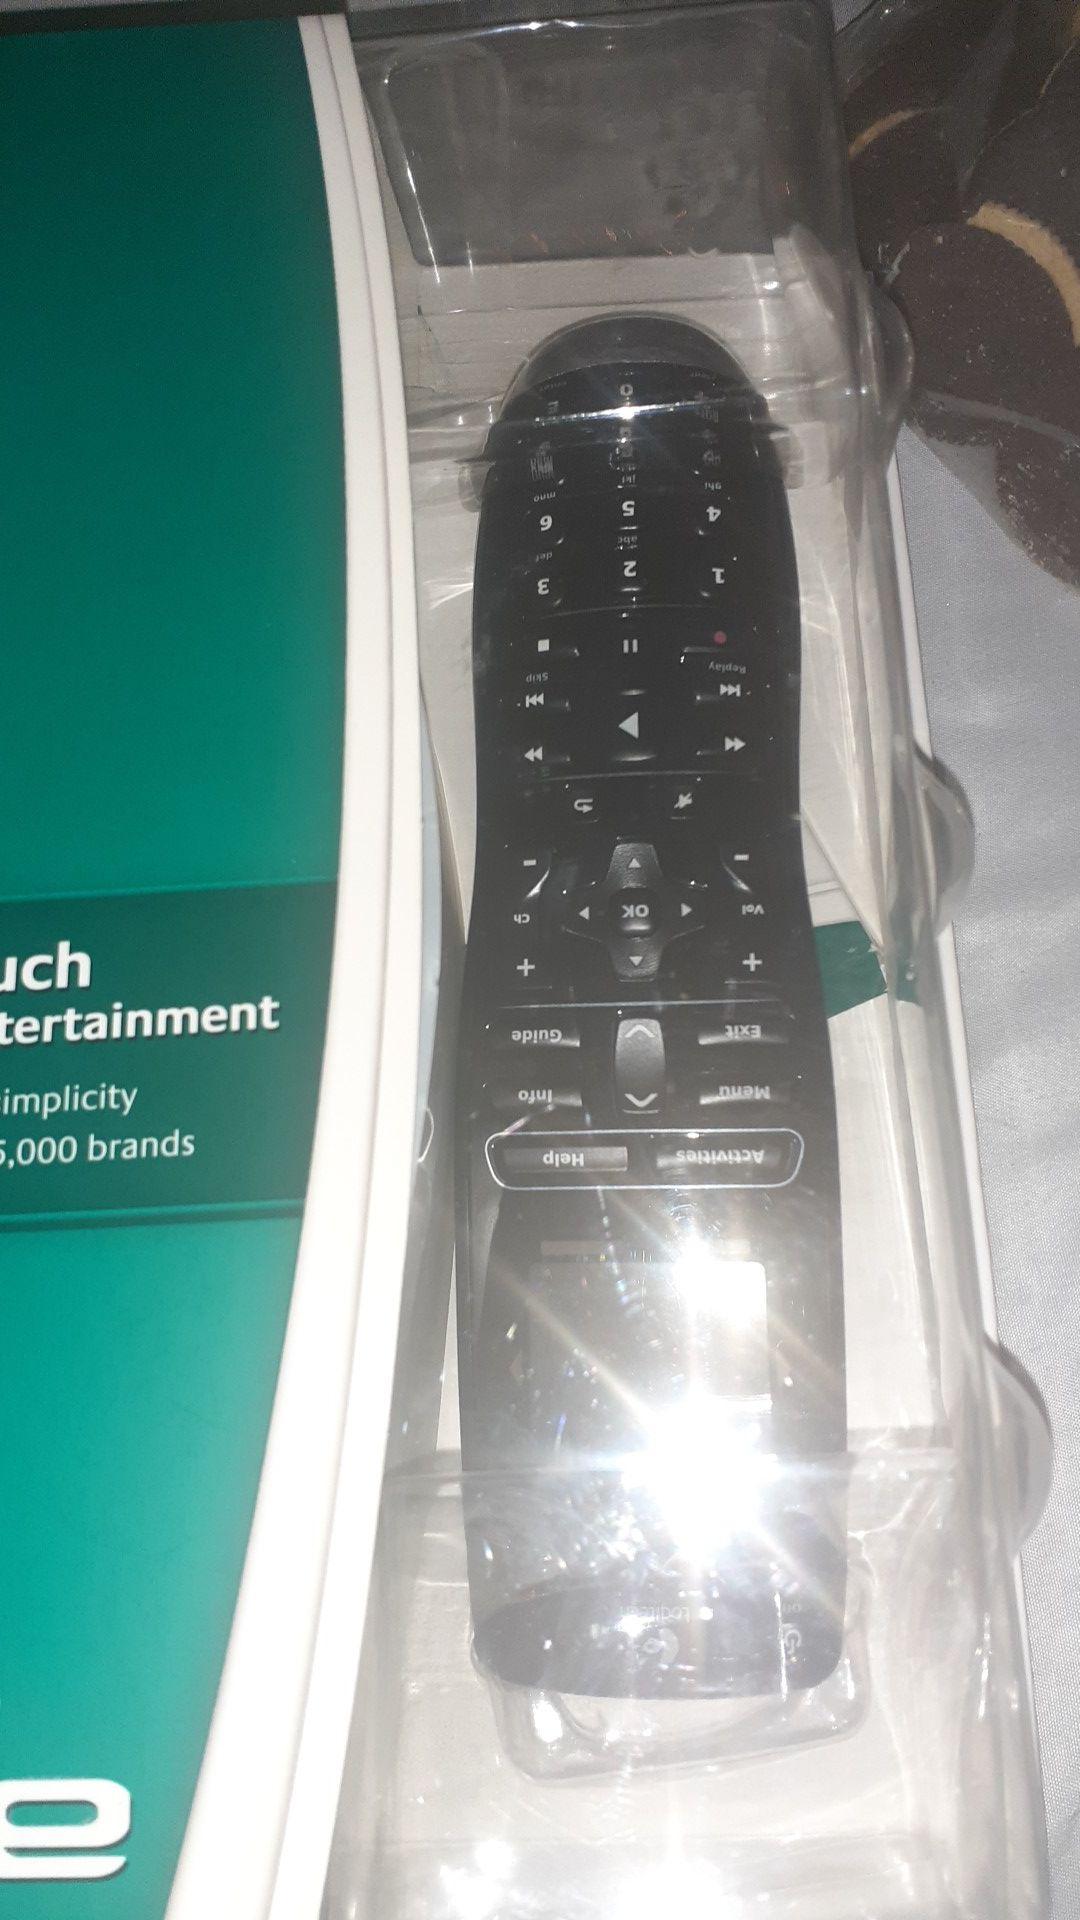 Touchscreen Universal remote